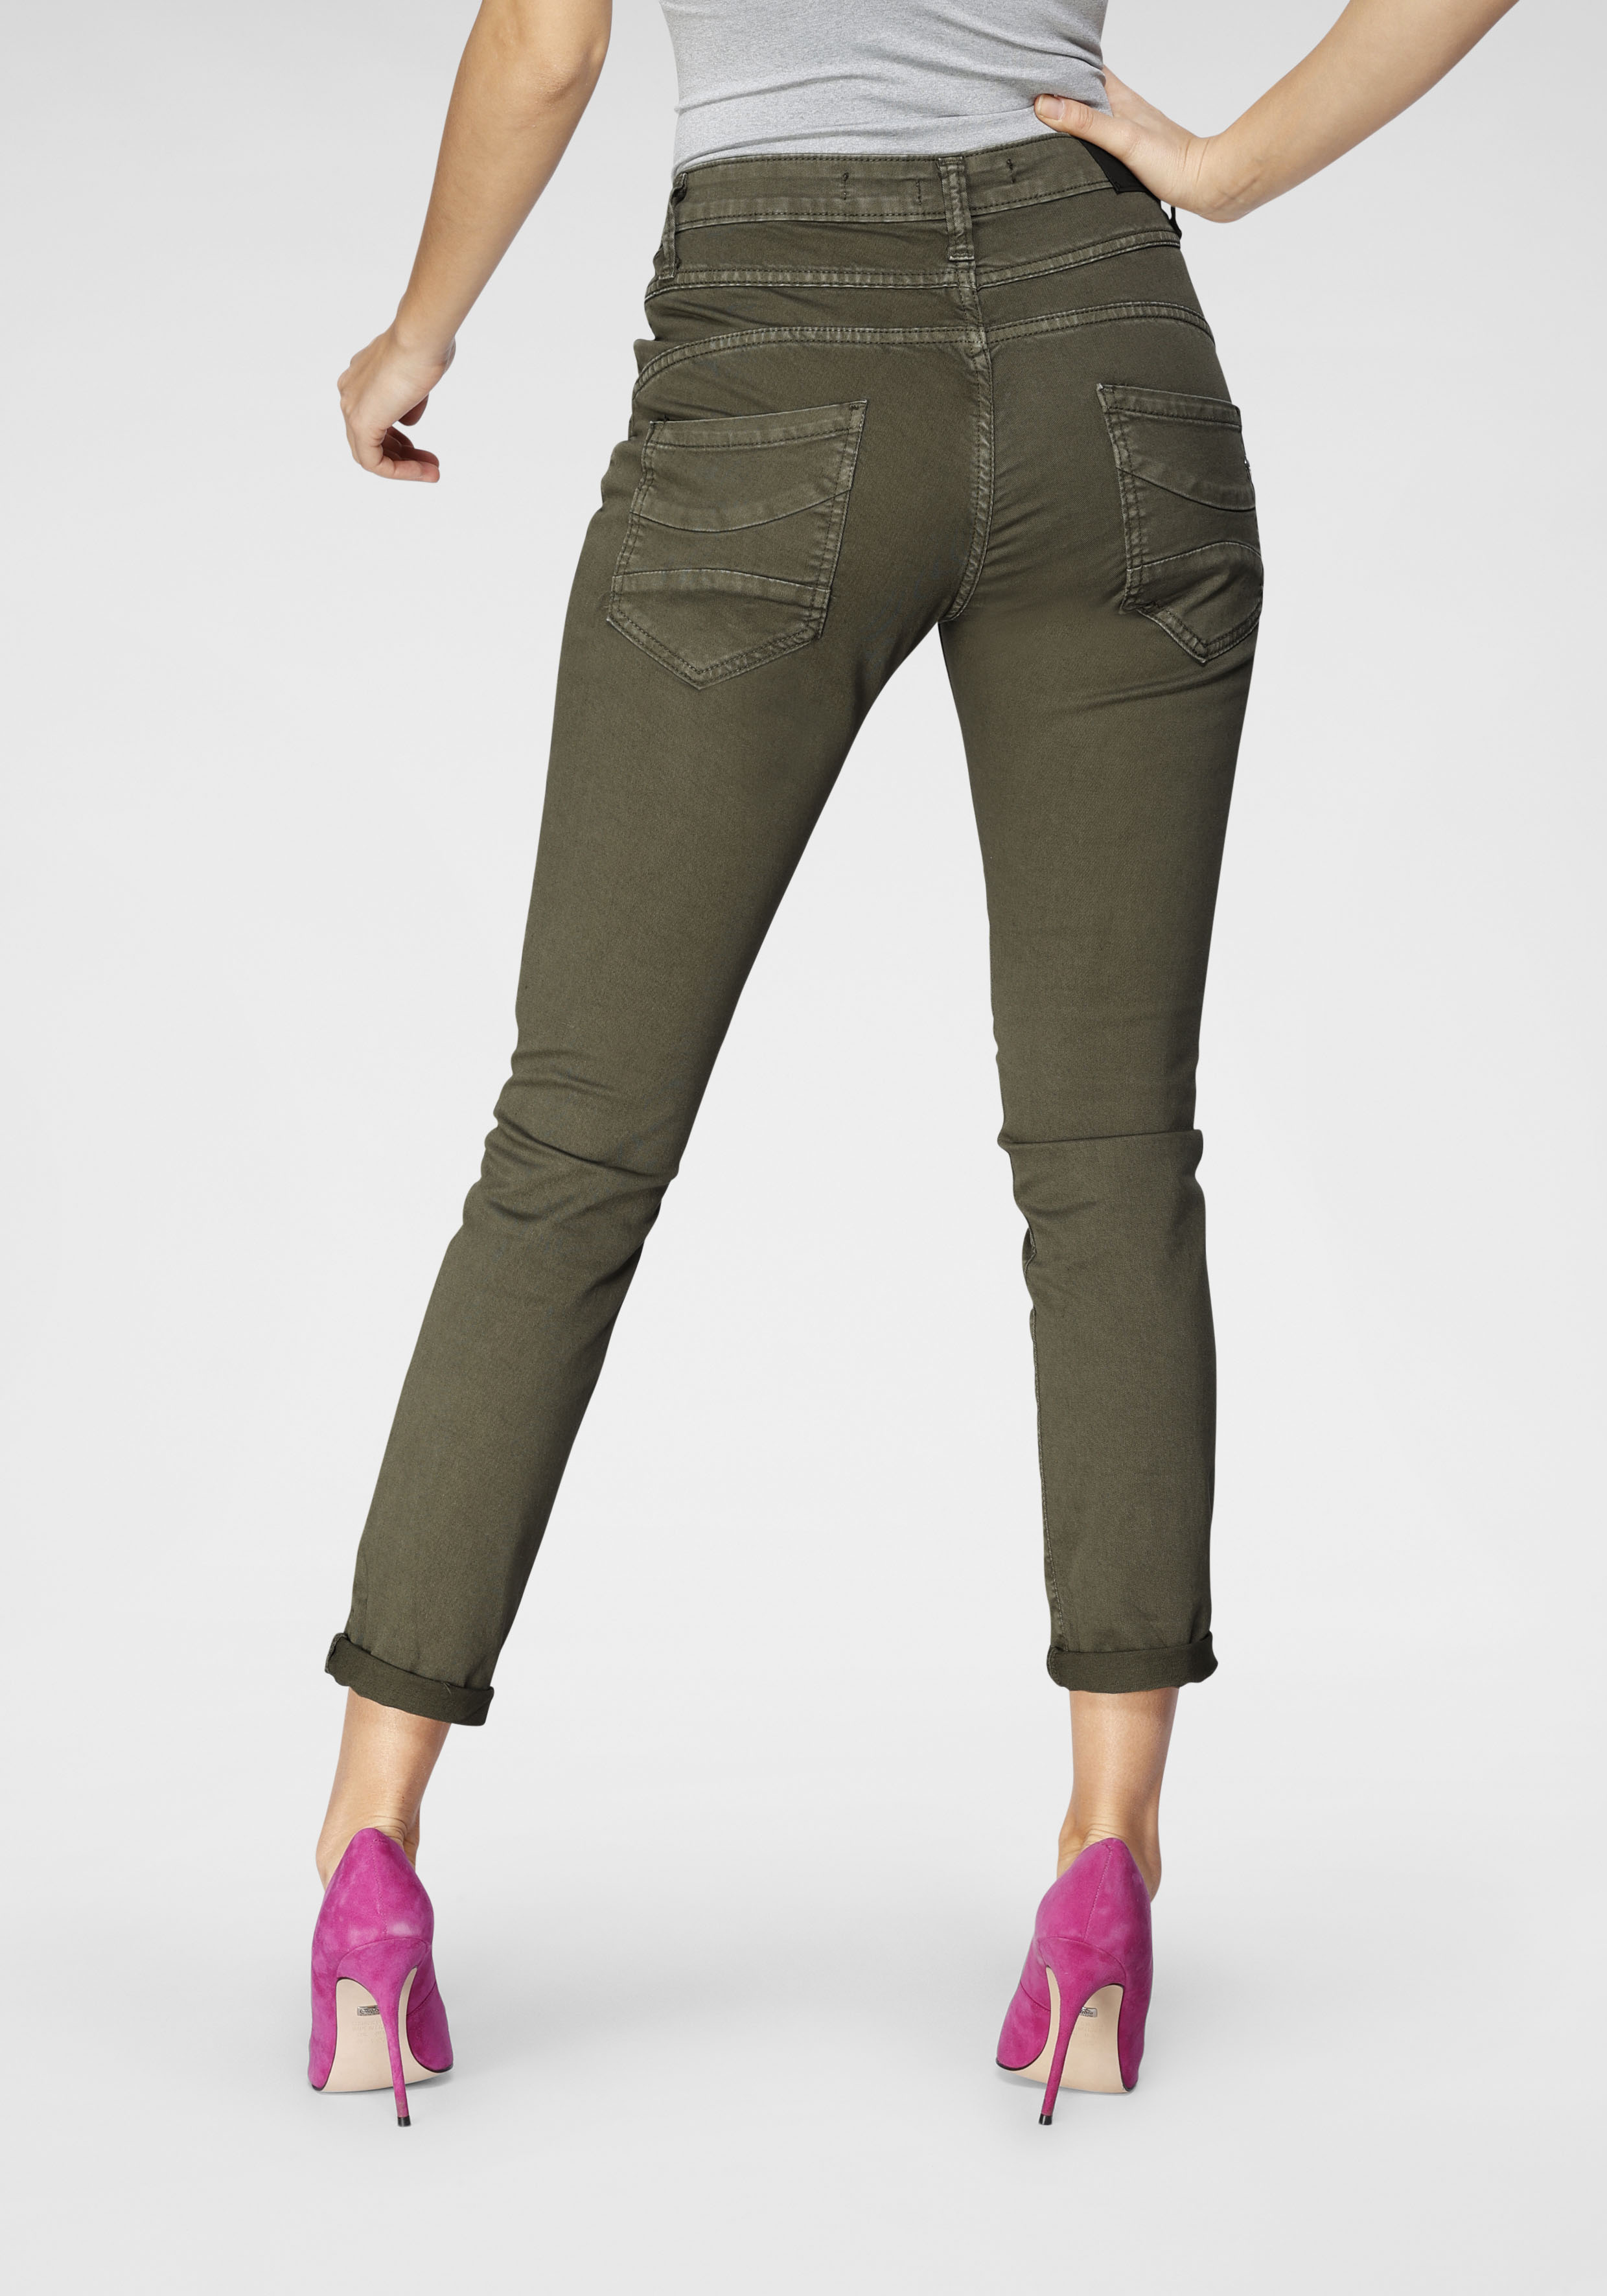 please jeans -  Boyfriend-Hose P78A, Original Boyfriend Cut